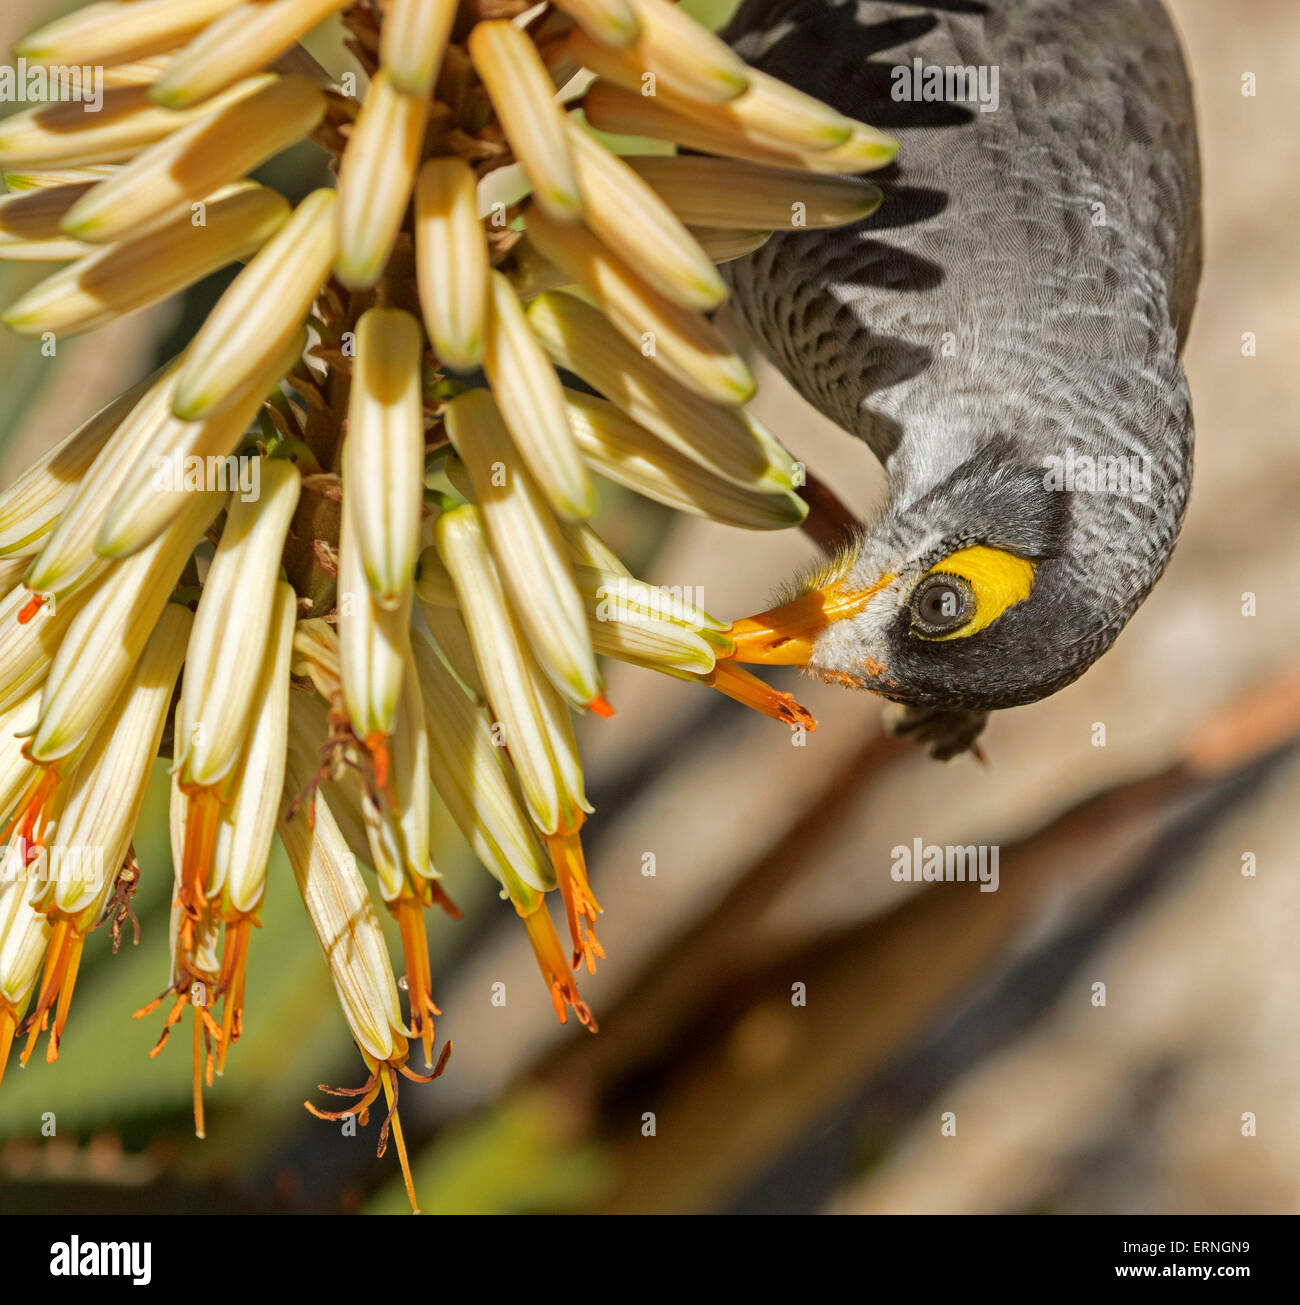 La minera ruidoso bird, Manorina melanocephala colgando cabeza abajo, alimentándose de flores tubulares crema Imagen De Stock